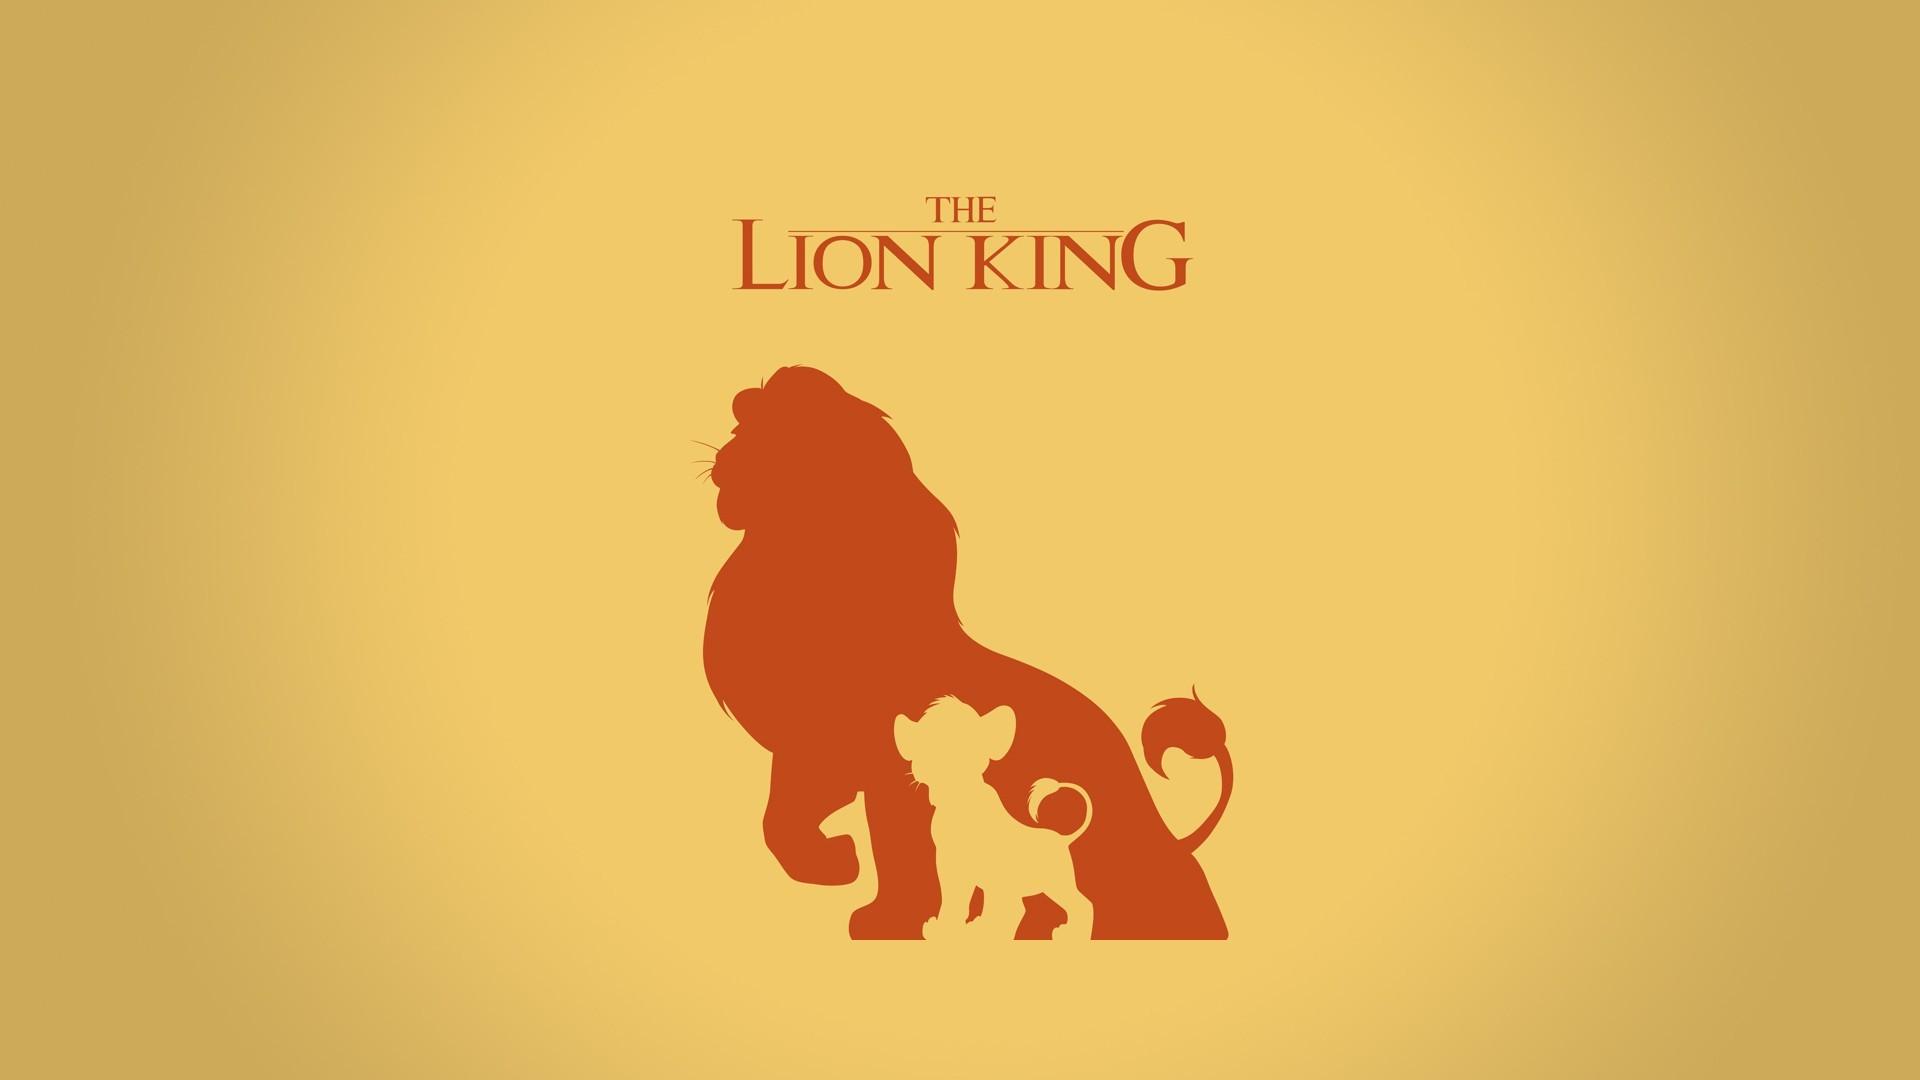 The Lion King Silhouette Disney HD Wallpaper